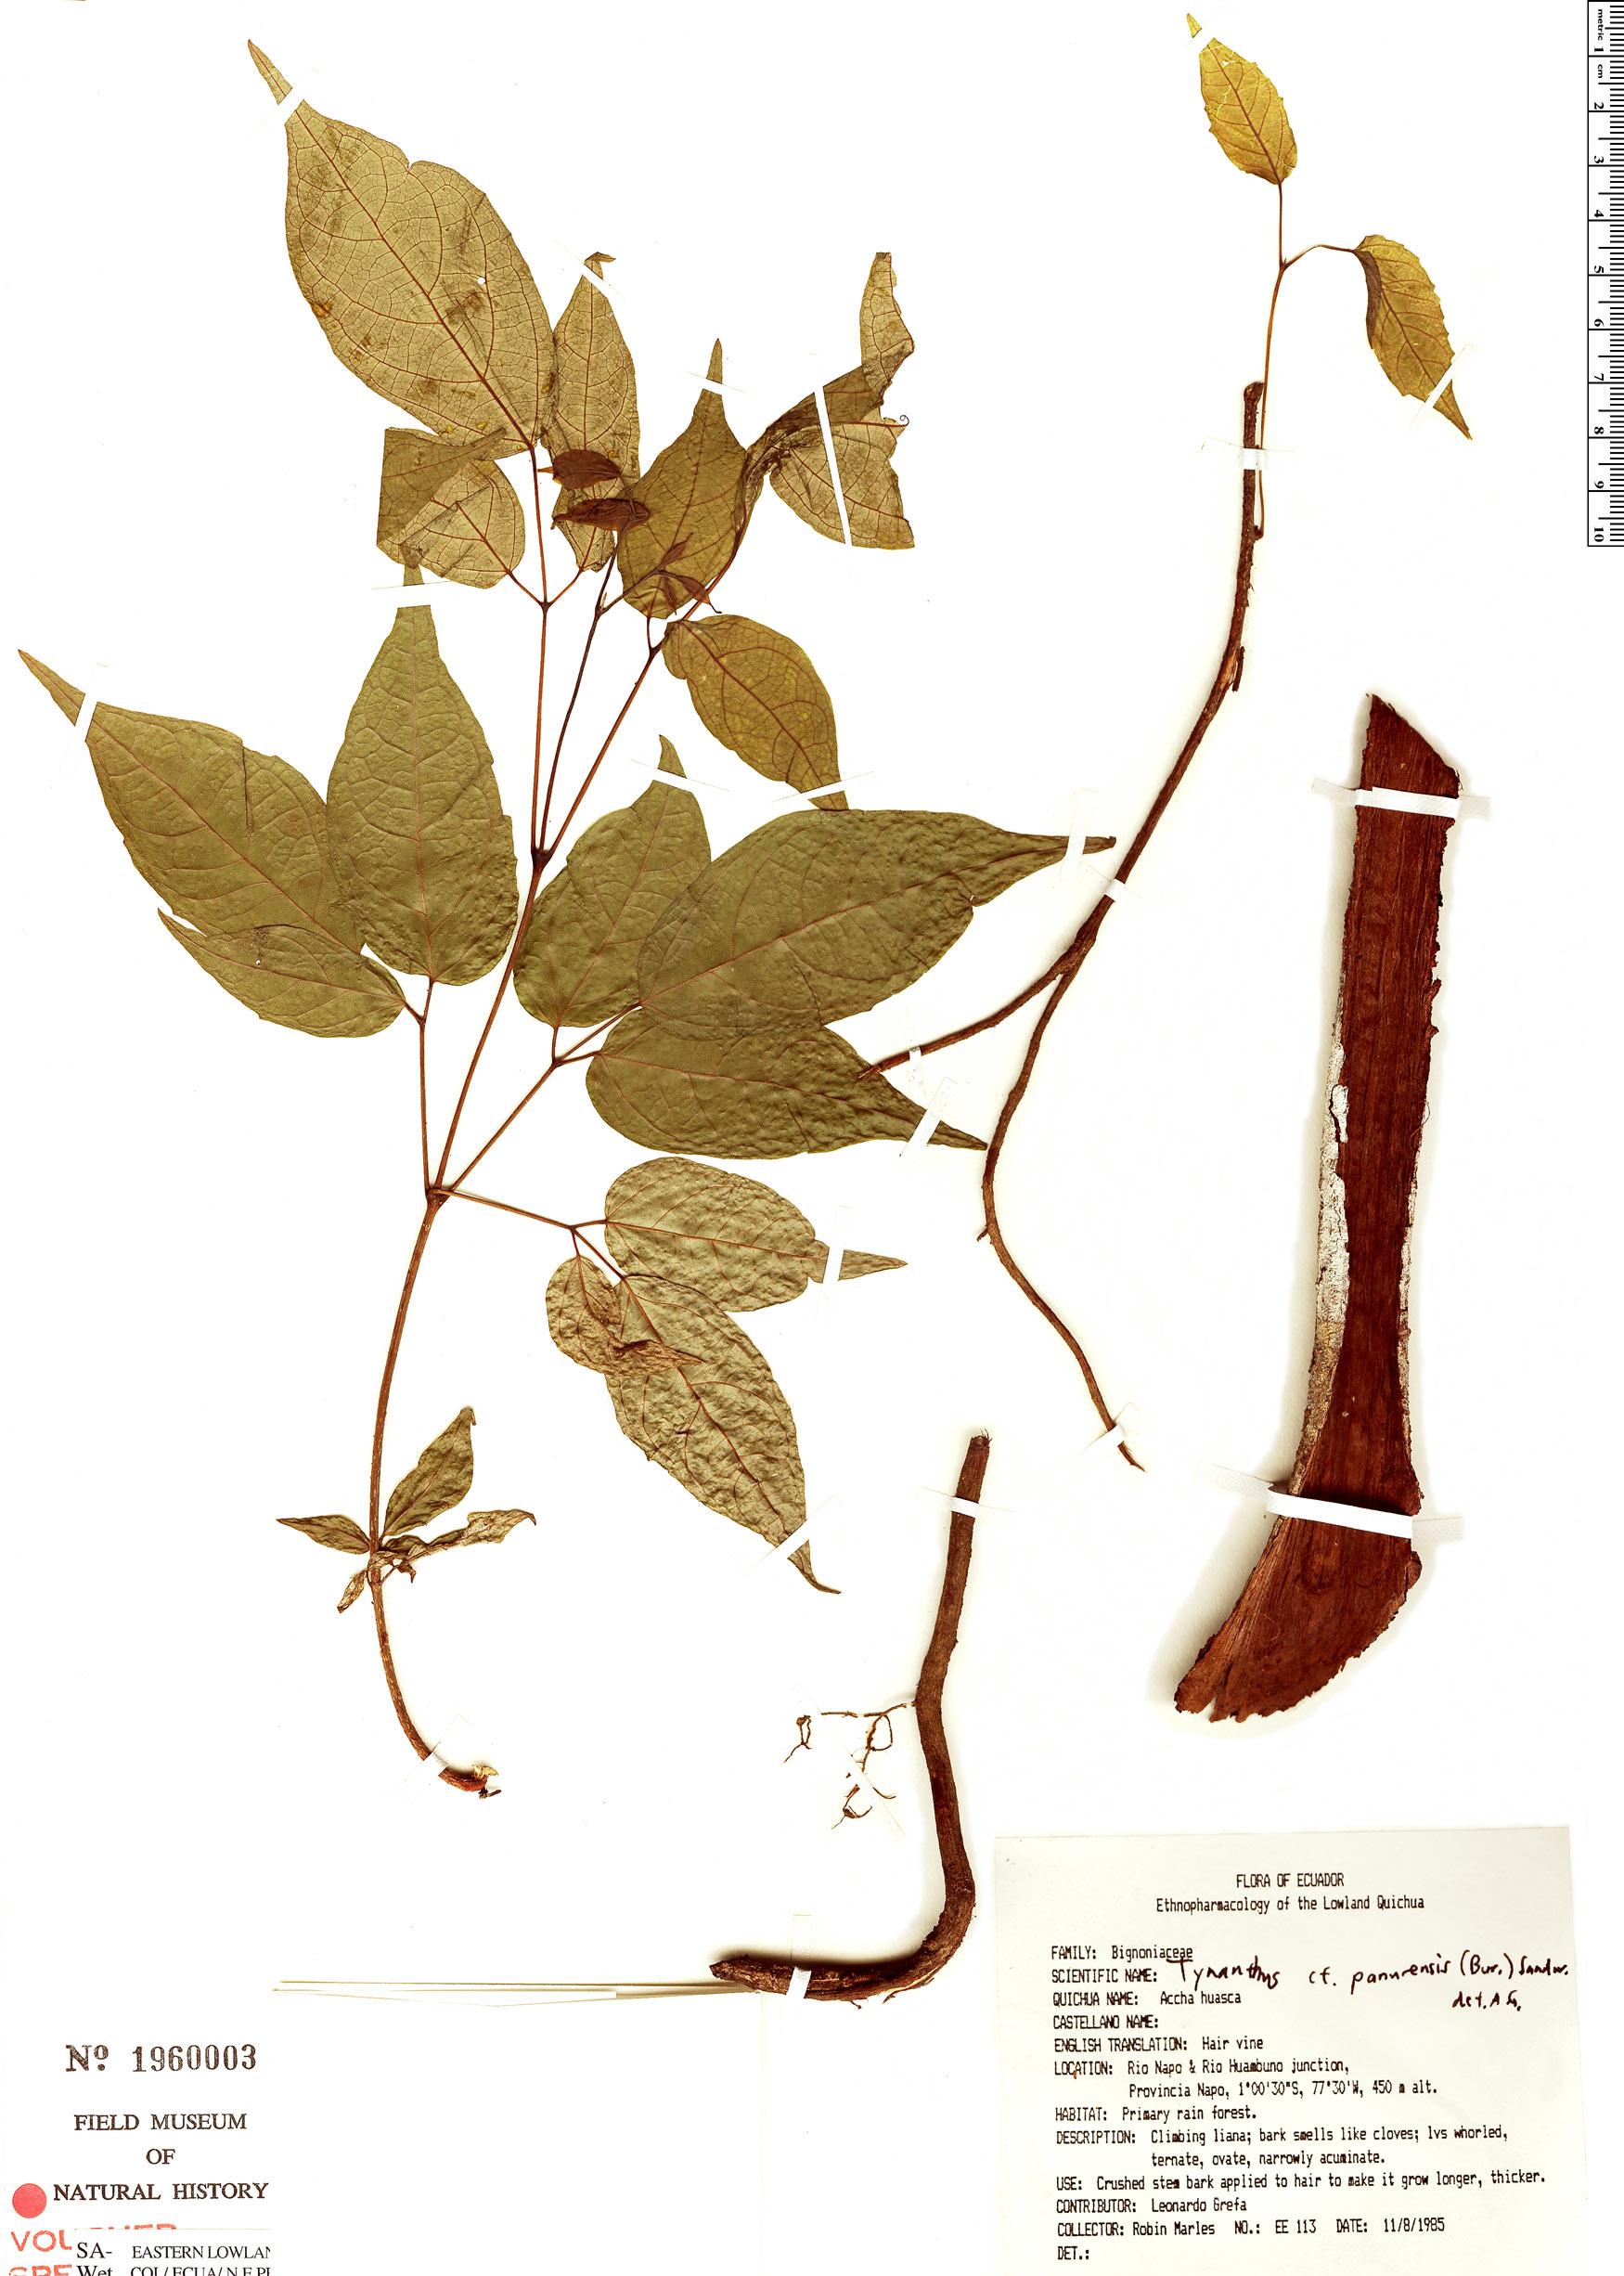 Espécime: Tynanthus panurensis